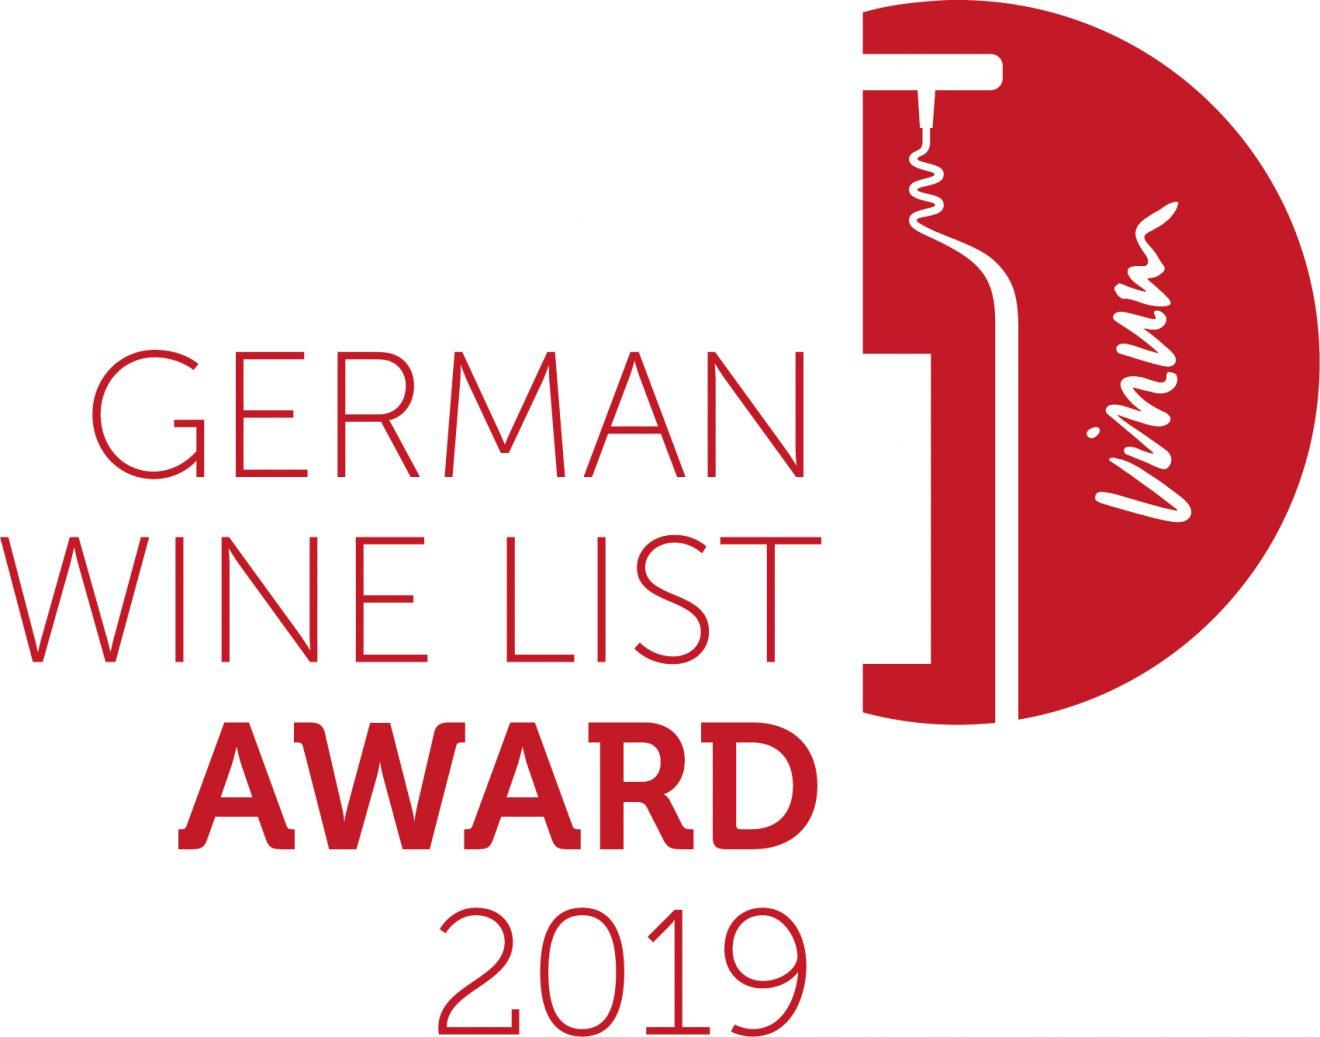 German Wine List Award 2019